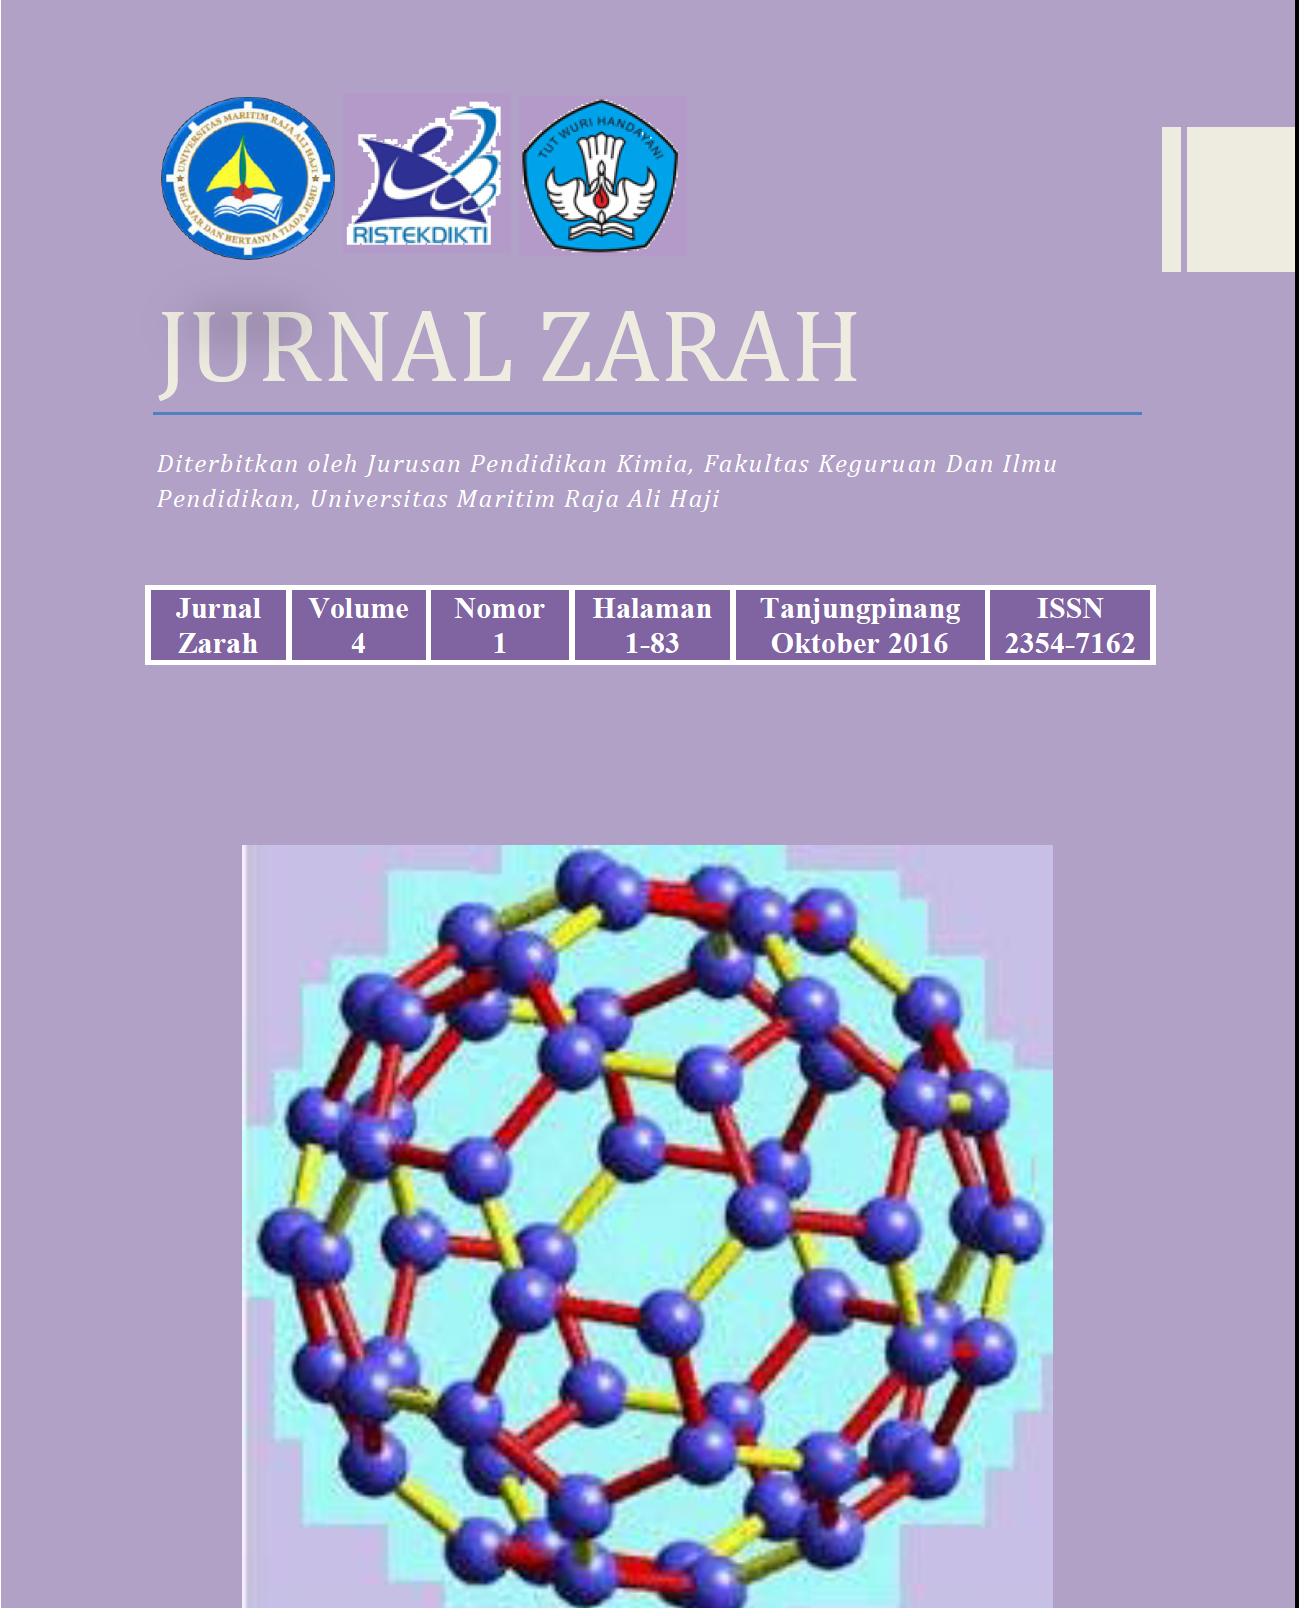 Jurnal Zarah Pendidikan Kimia Universitas Maritim Raja Ali Haji